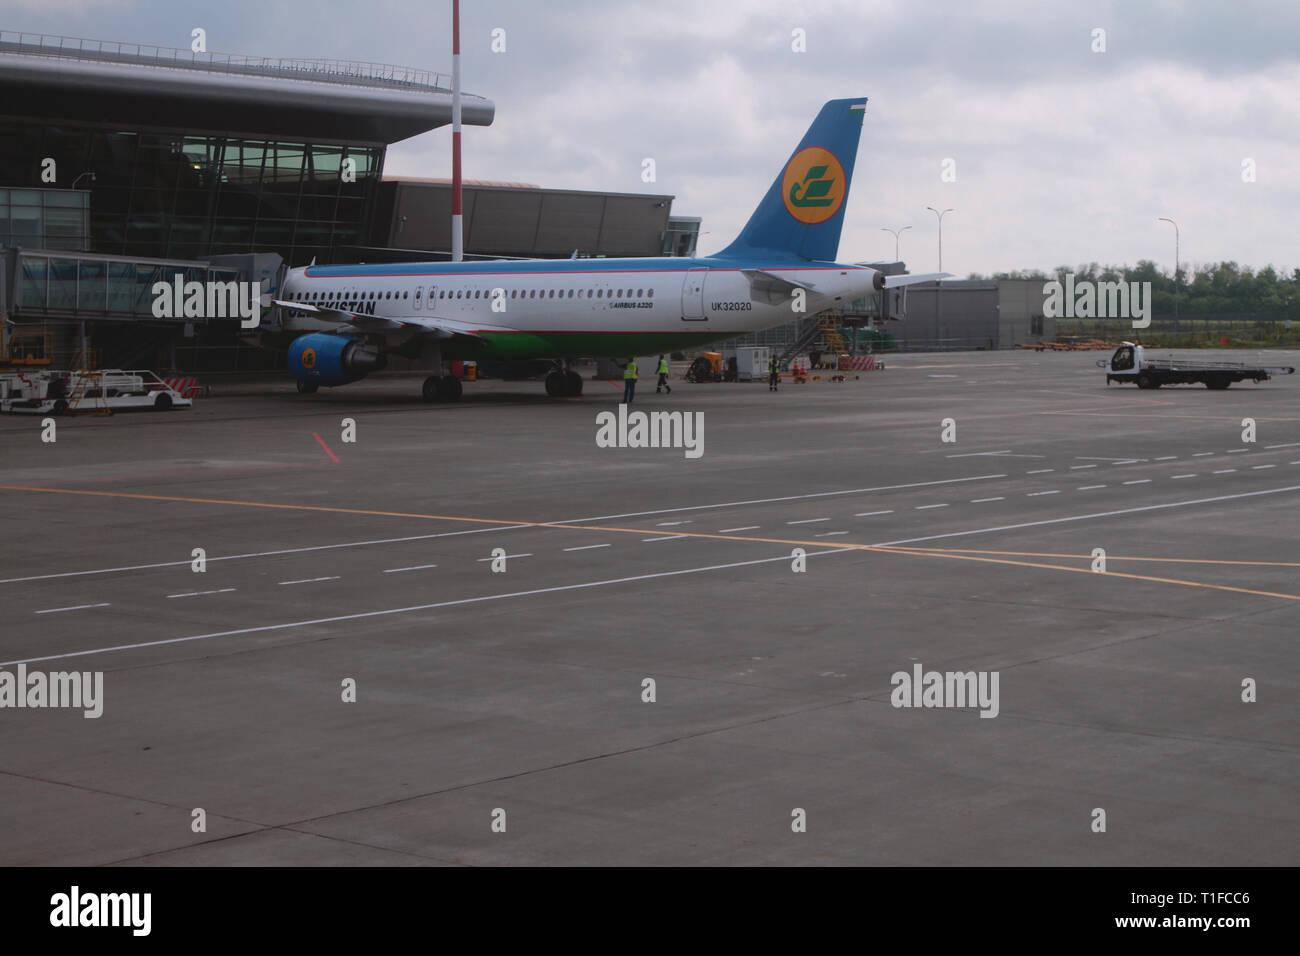 Kazan, Russia - Jul 19, 2018: Passenger plane at teleladder at airport - Stock Image